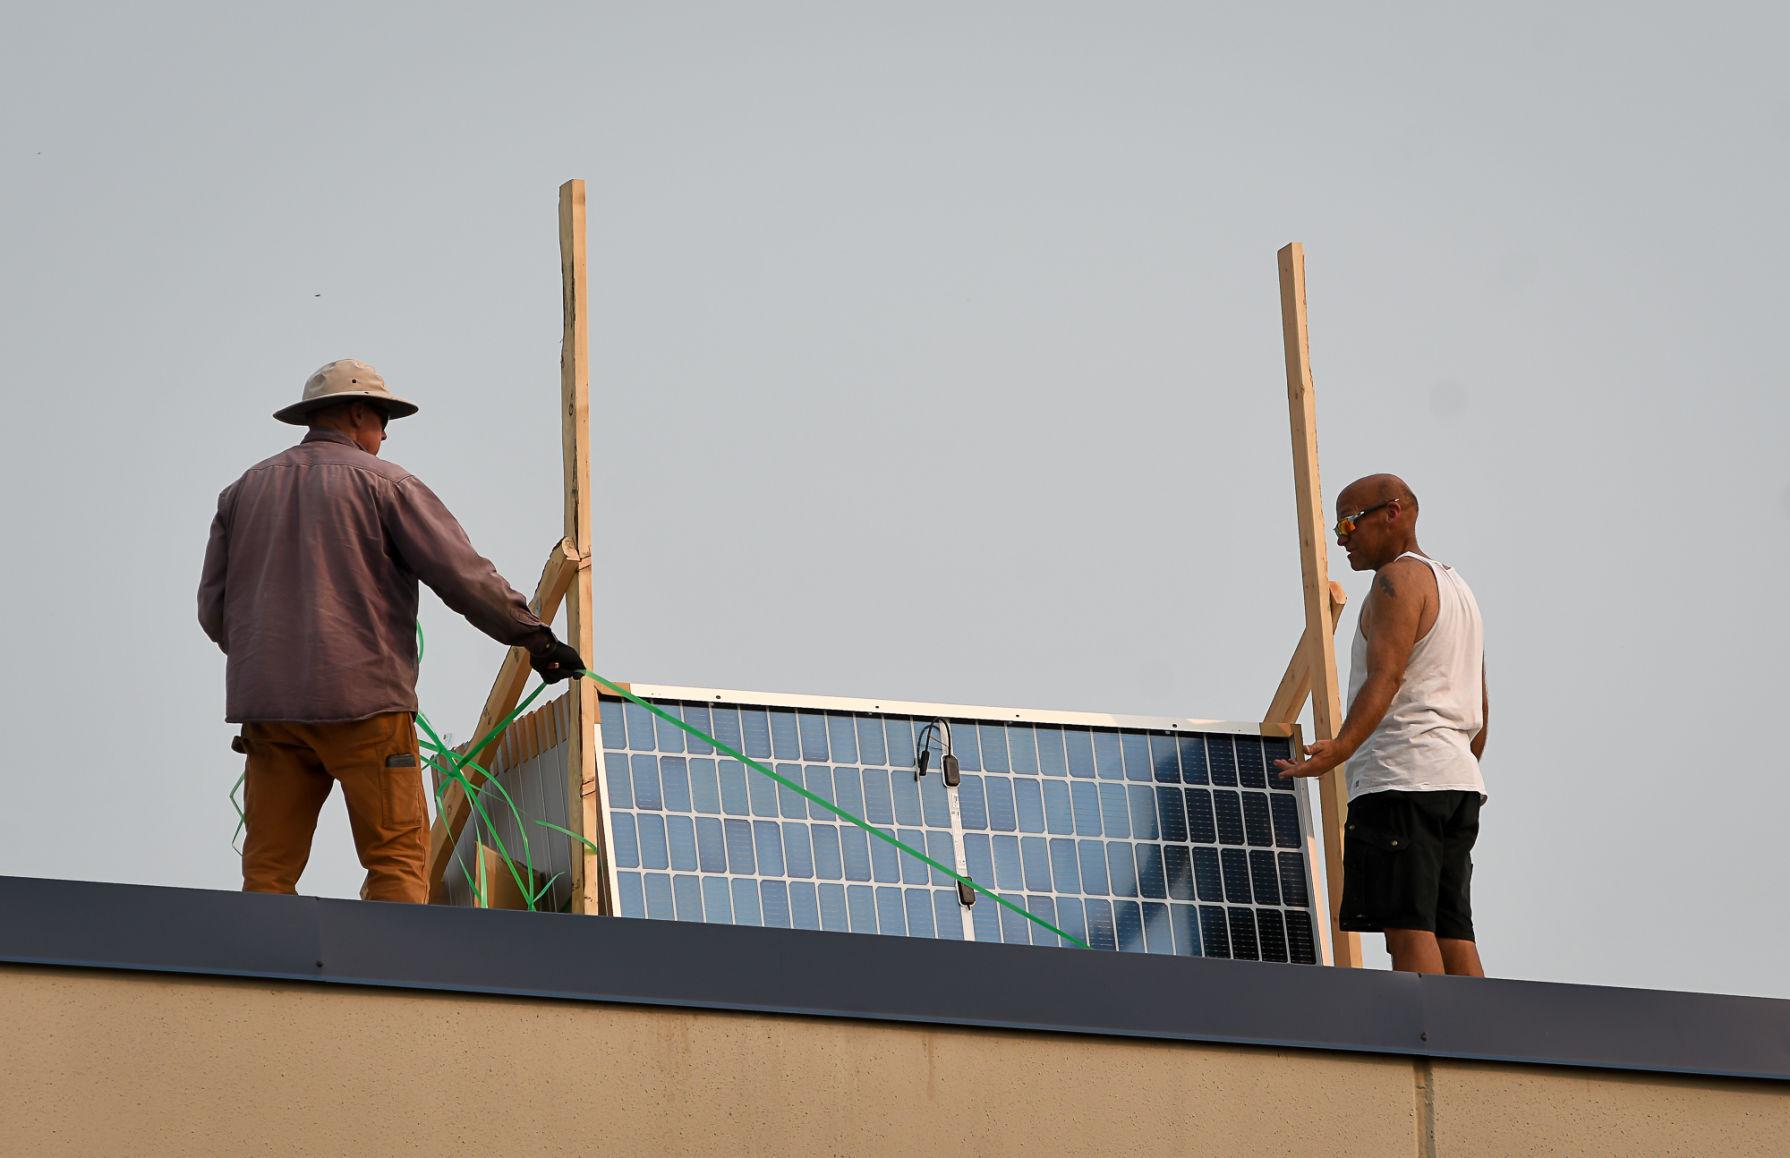 democratherald.com - JESSE SOWA jesse.sowa@lee.net - Benton County building becomes latest Solarize Corvallis project